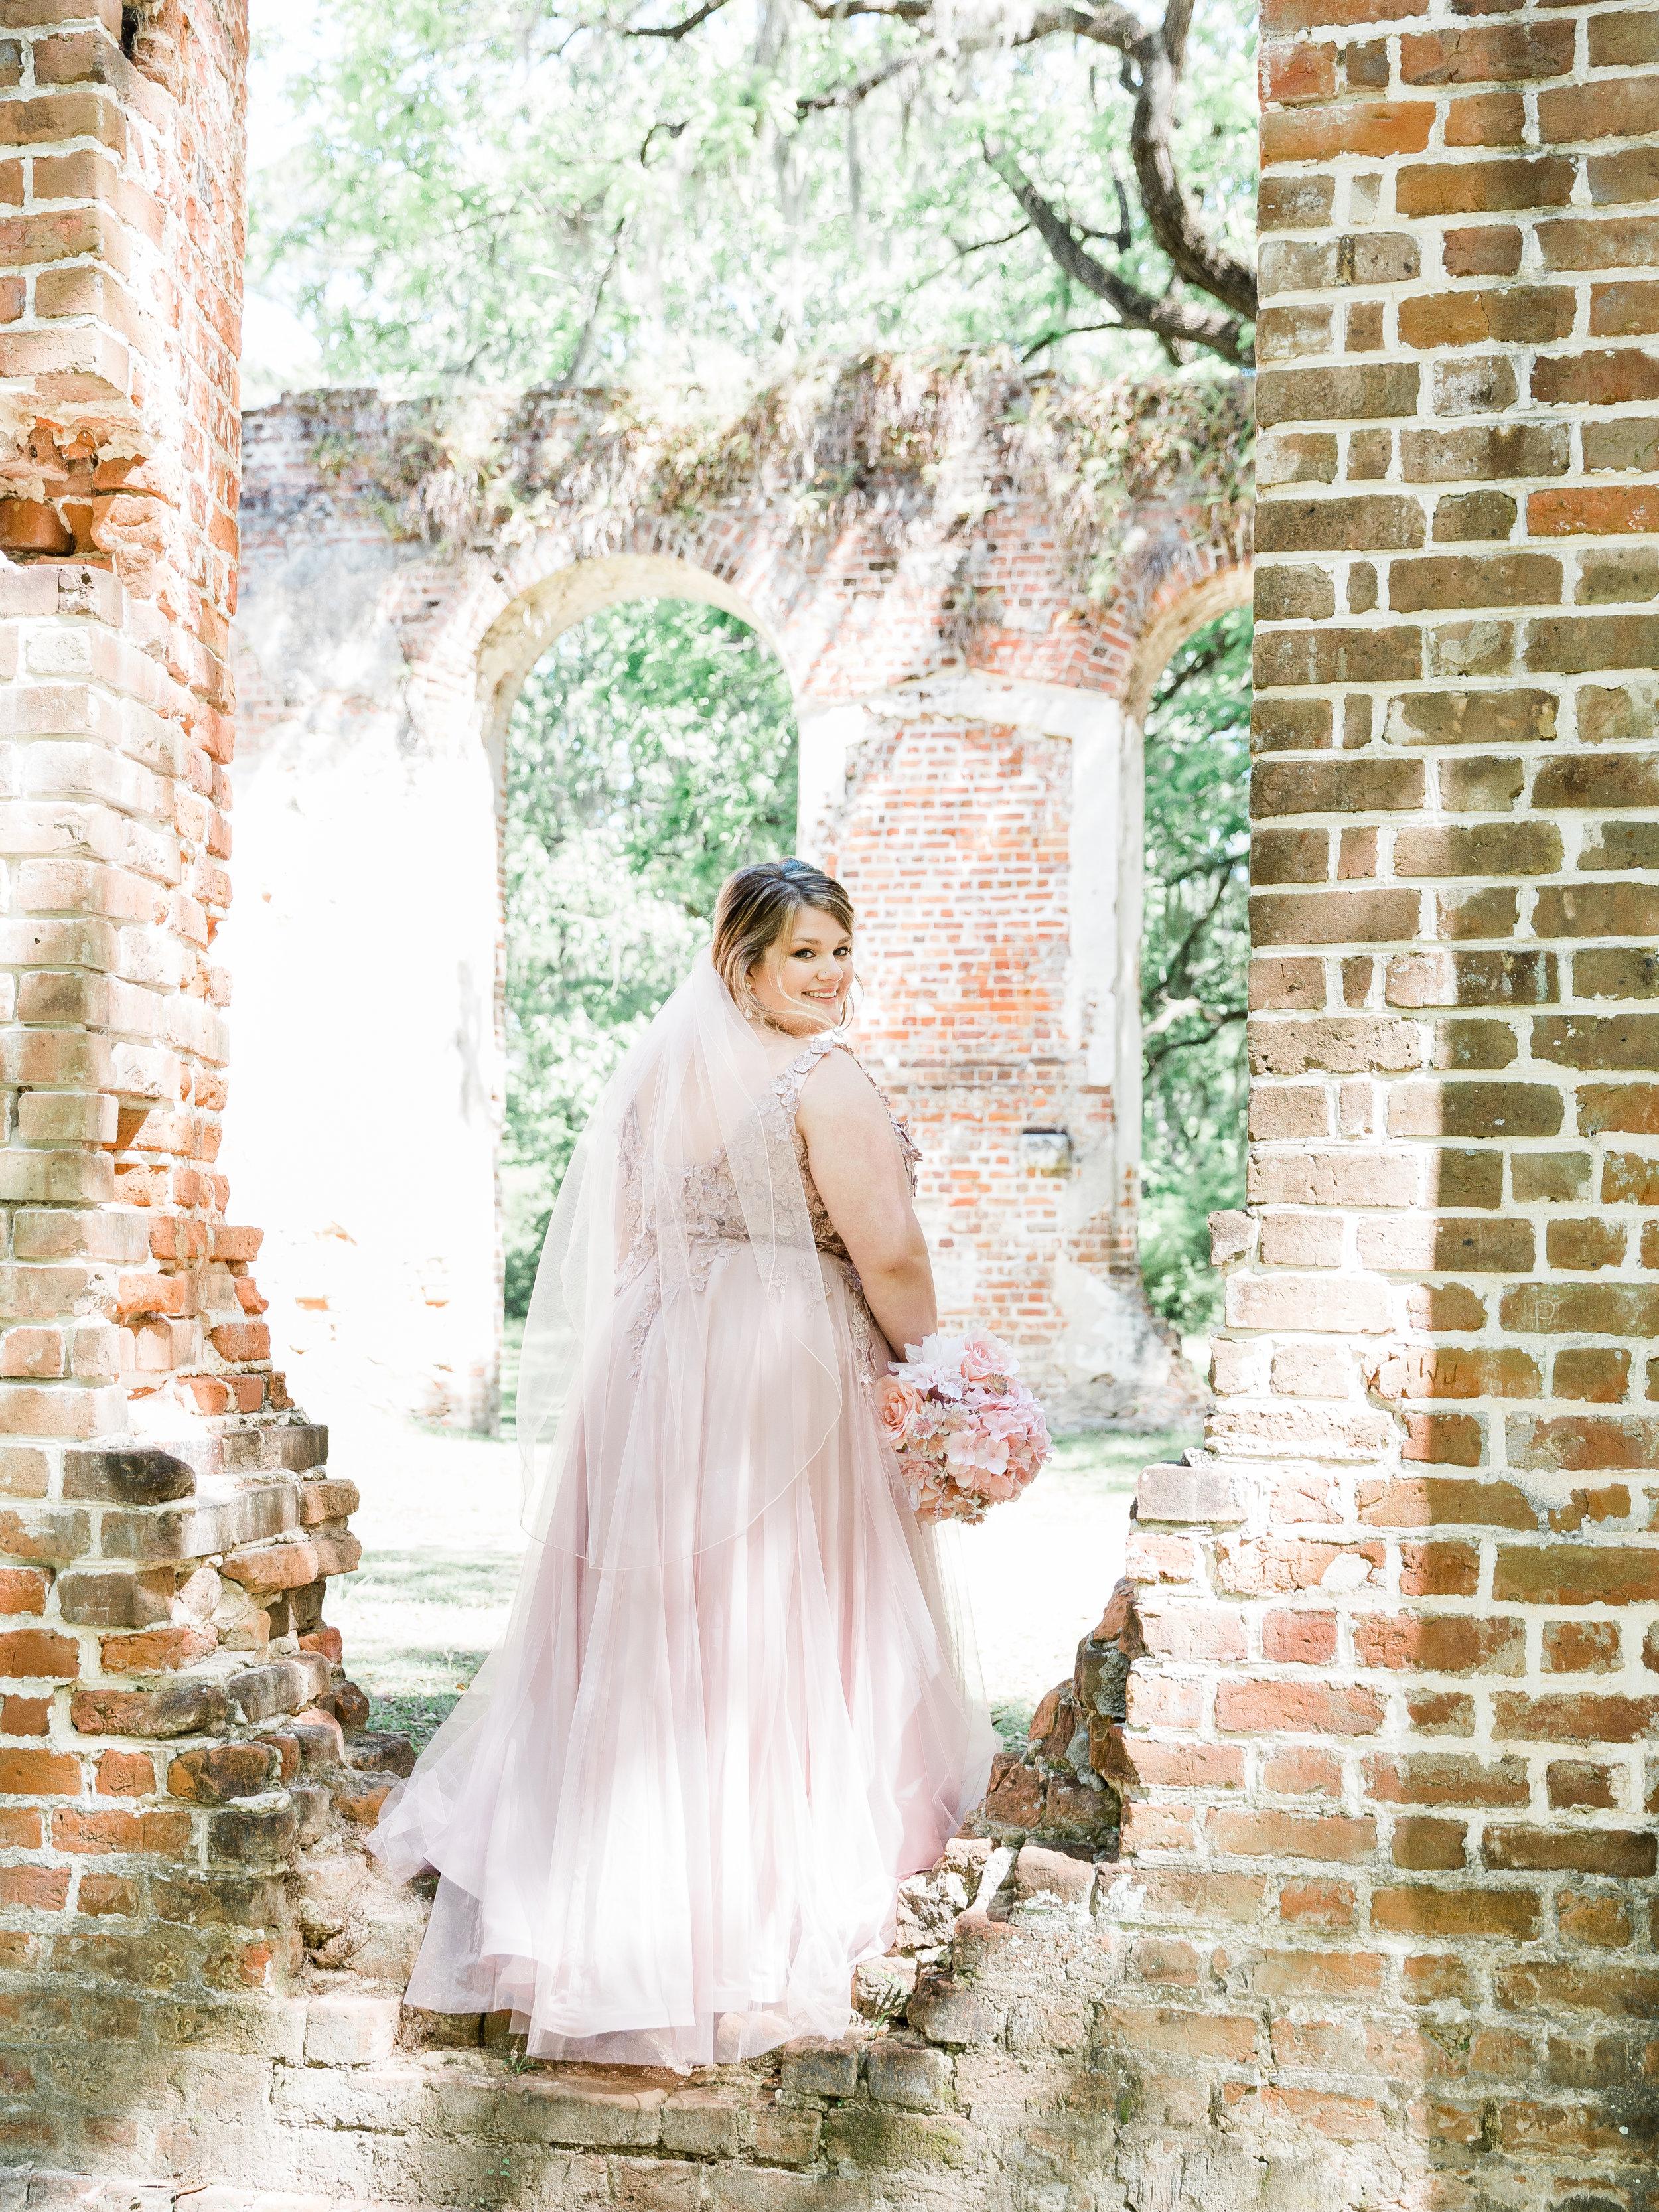 20190417-Southern Lens Photography-savannah family photographer- Ashley and Zack-old sheldon church ruins-201929.jpg